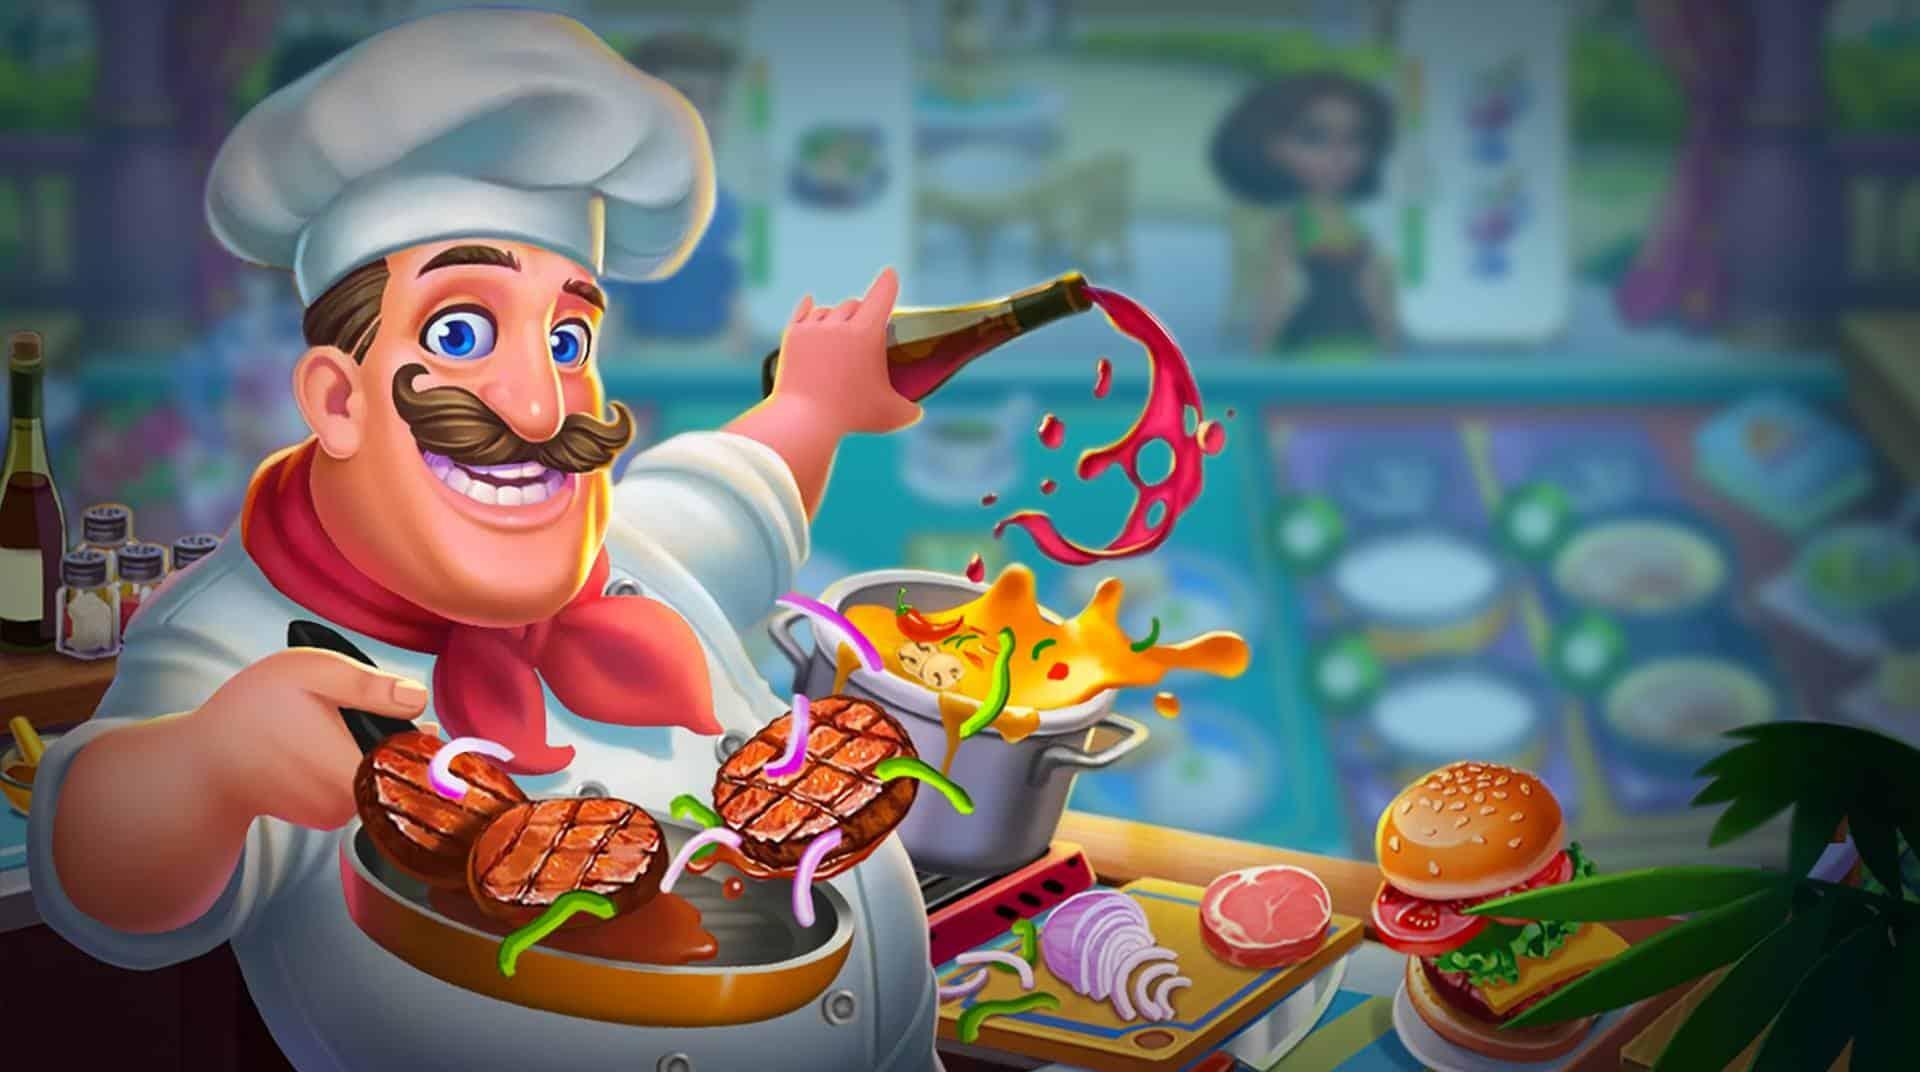 تحميل لعبة Cooking Madness من متجر جوجل بلاي